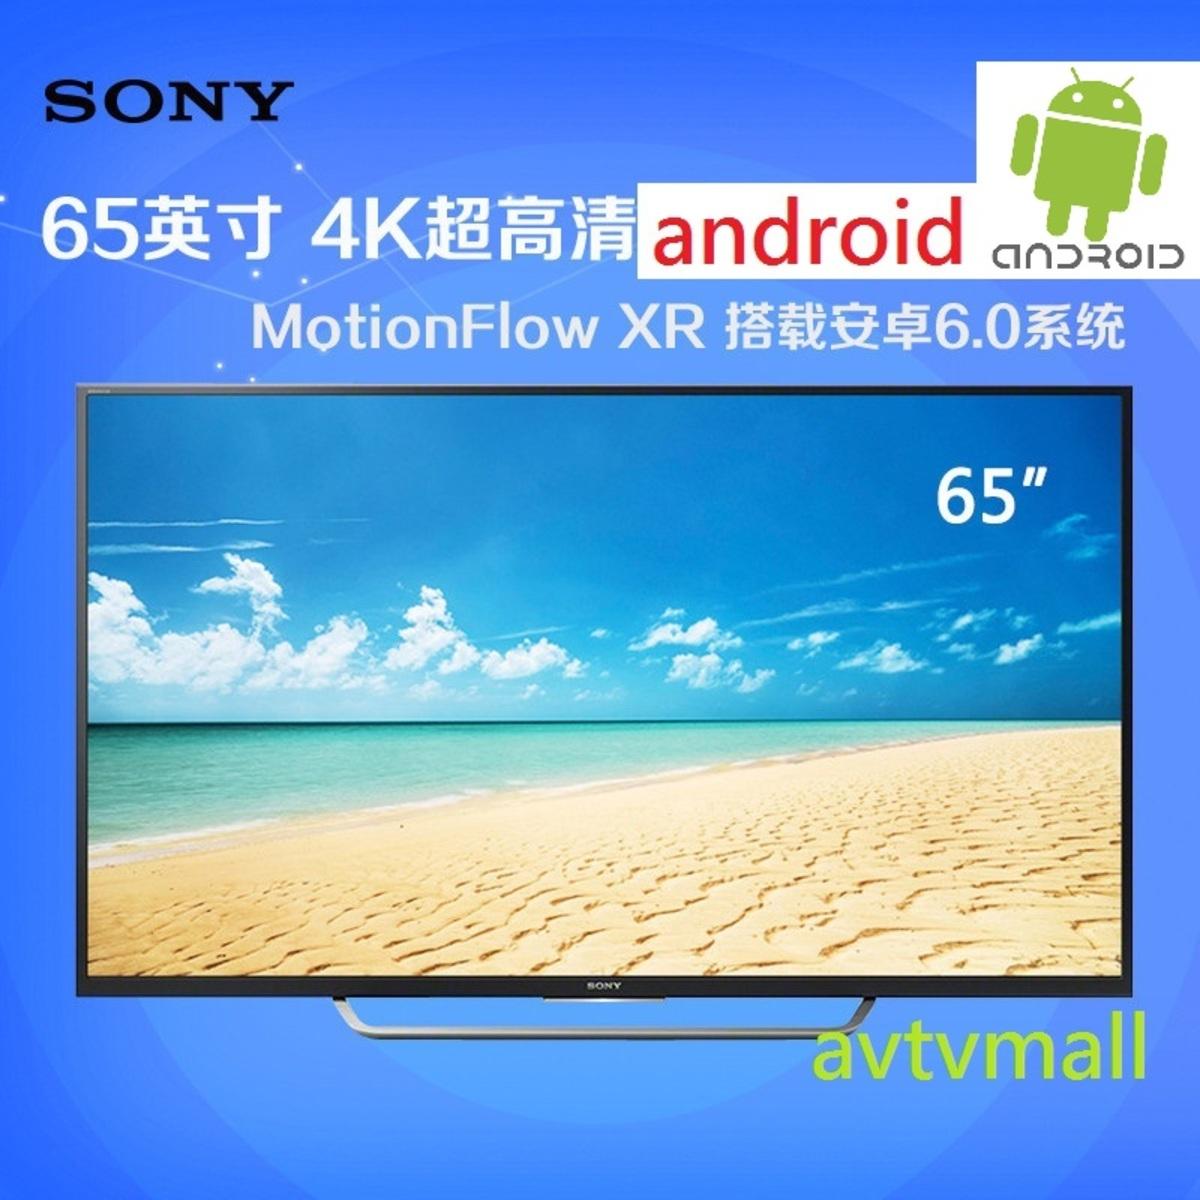 "KD-65X7500D 65""LED 4K X-Reality Pro 超高清 ANDROID 智能電視(2年行貨保用)"